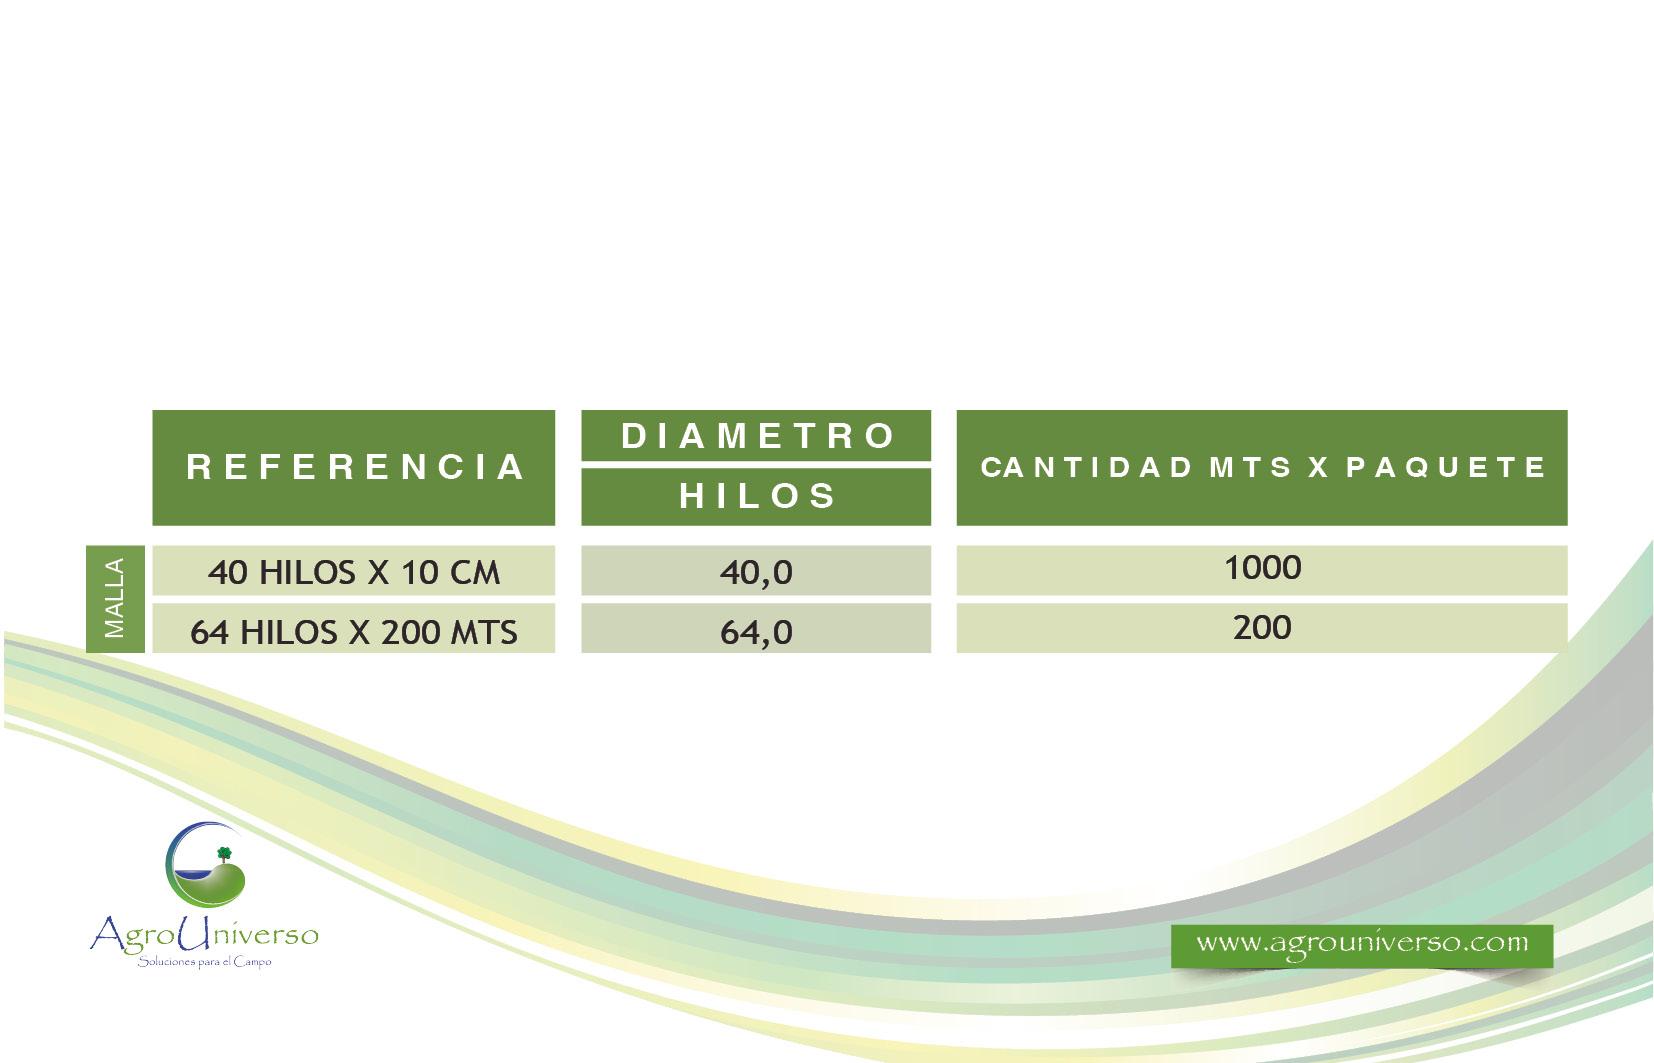 Catlogo-de-productos-Agrouniverso-39